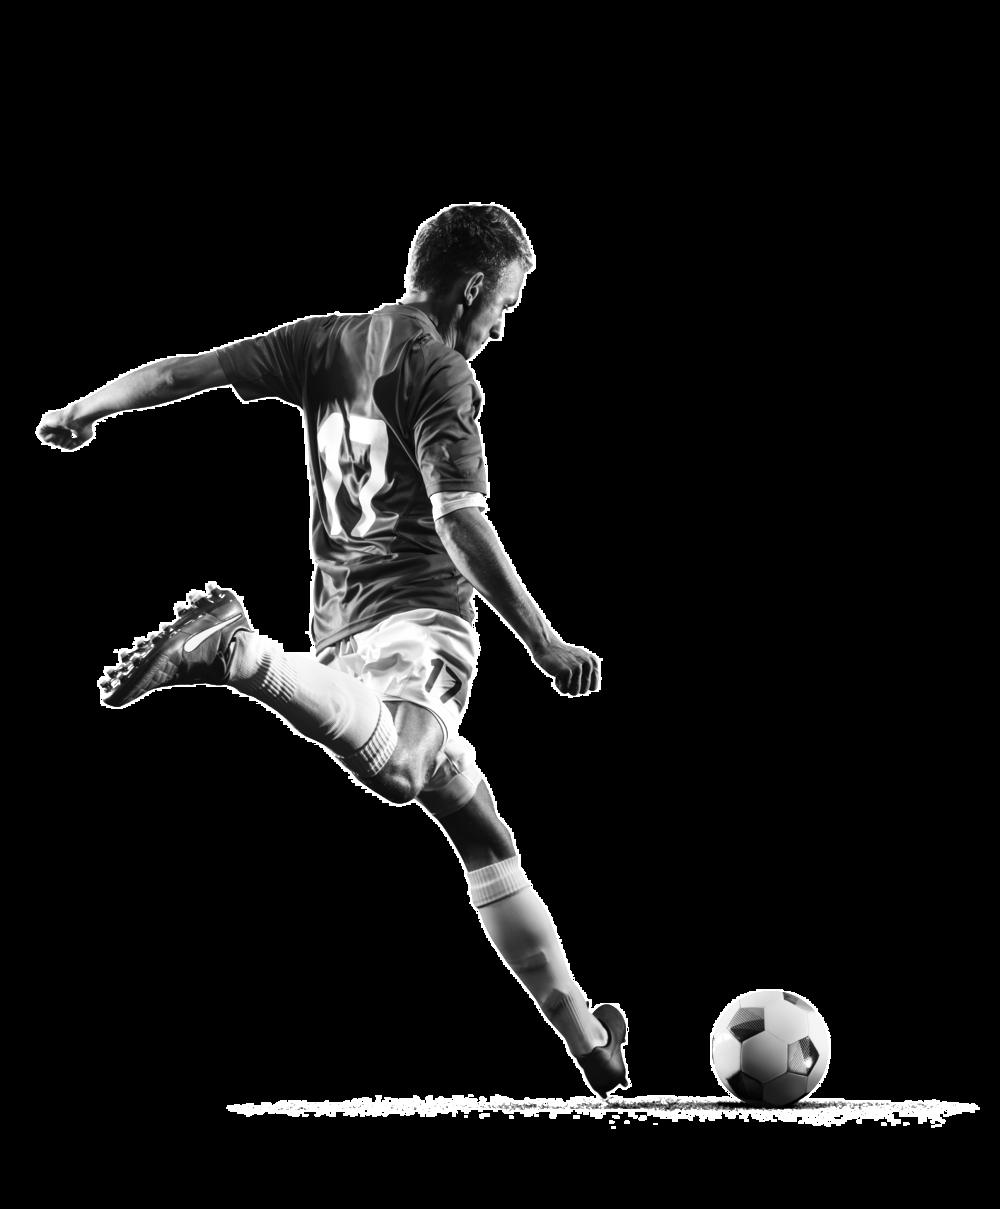 Soccer_3B&W.png